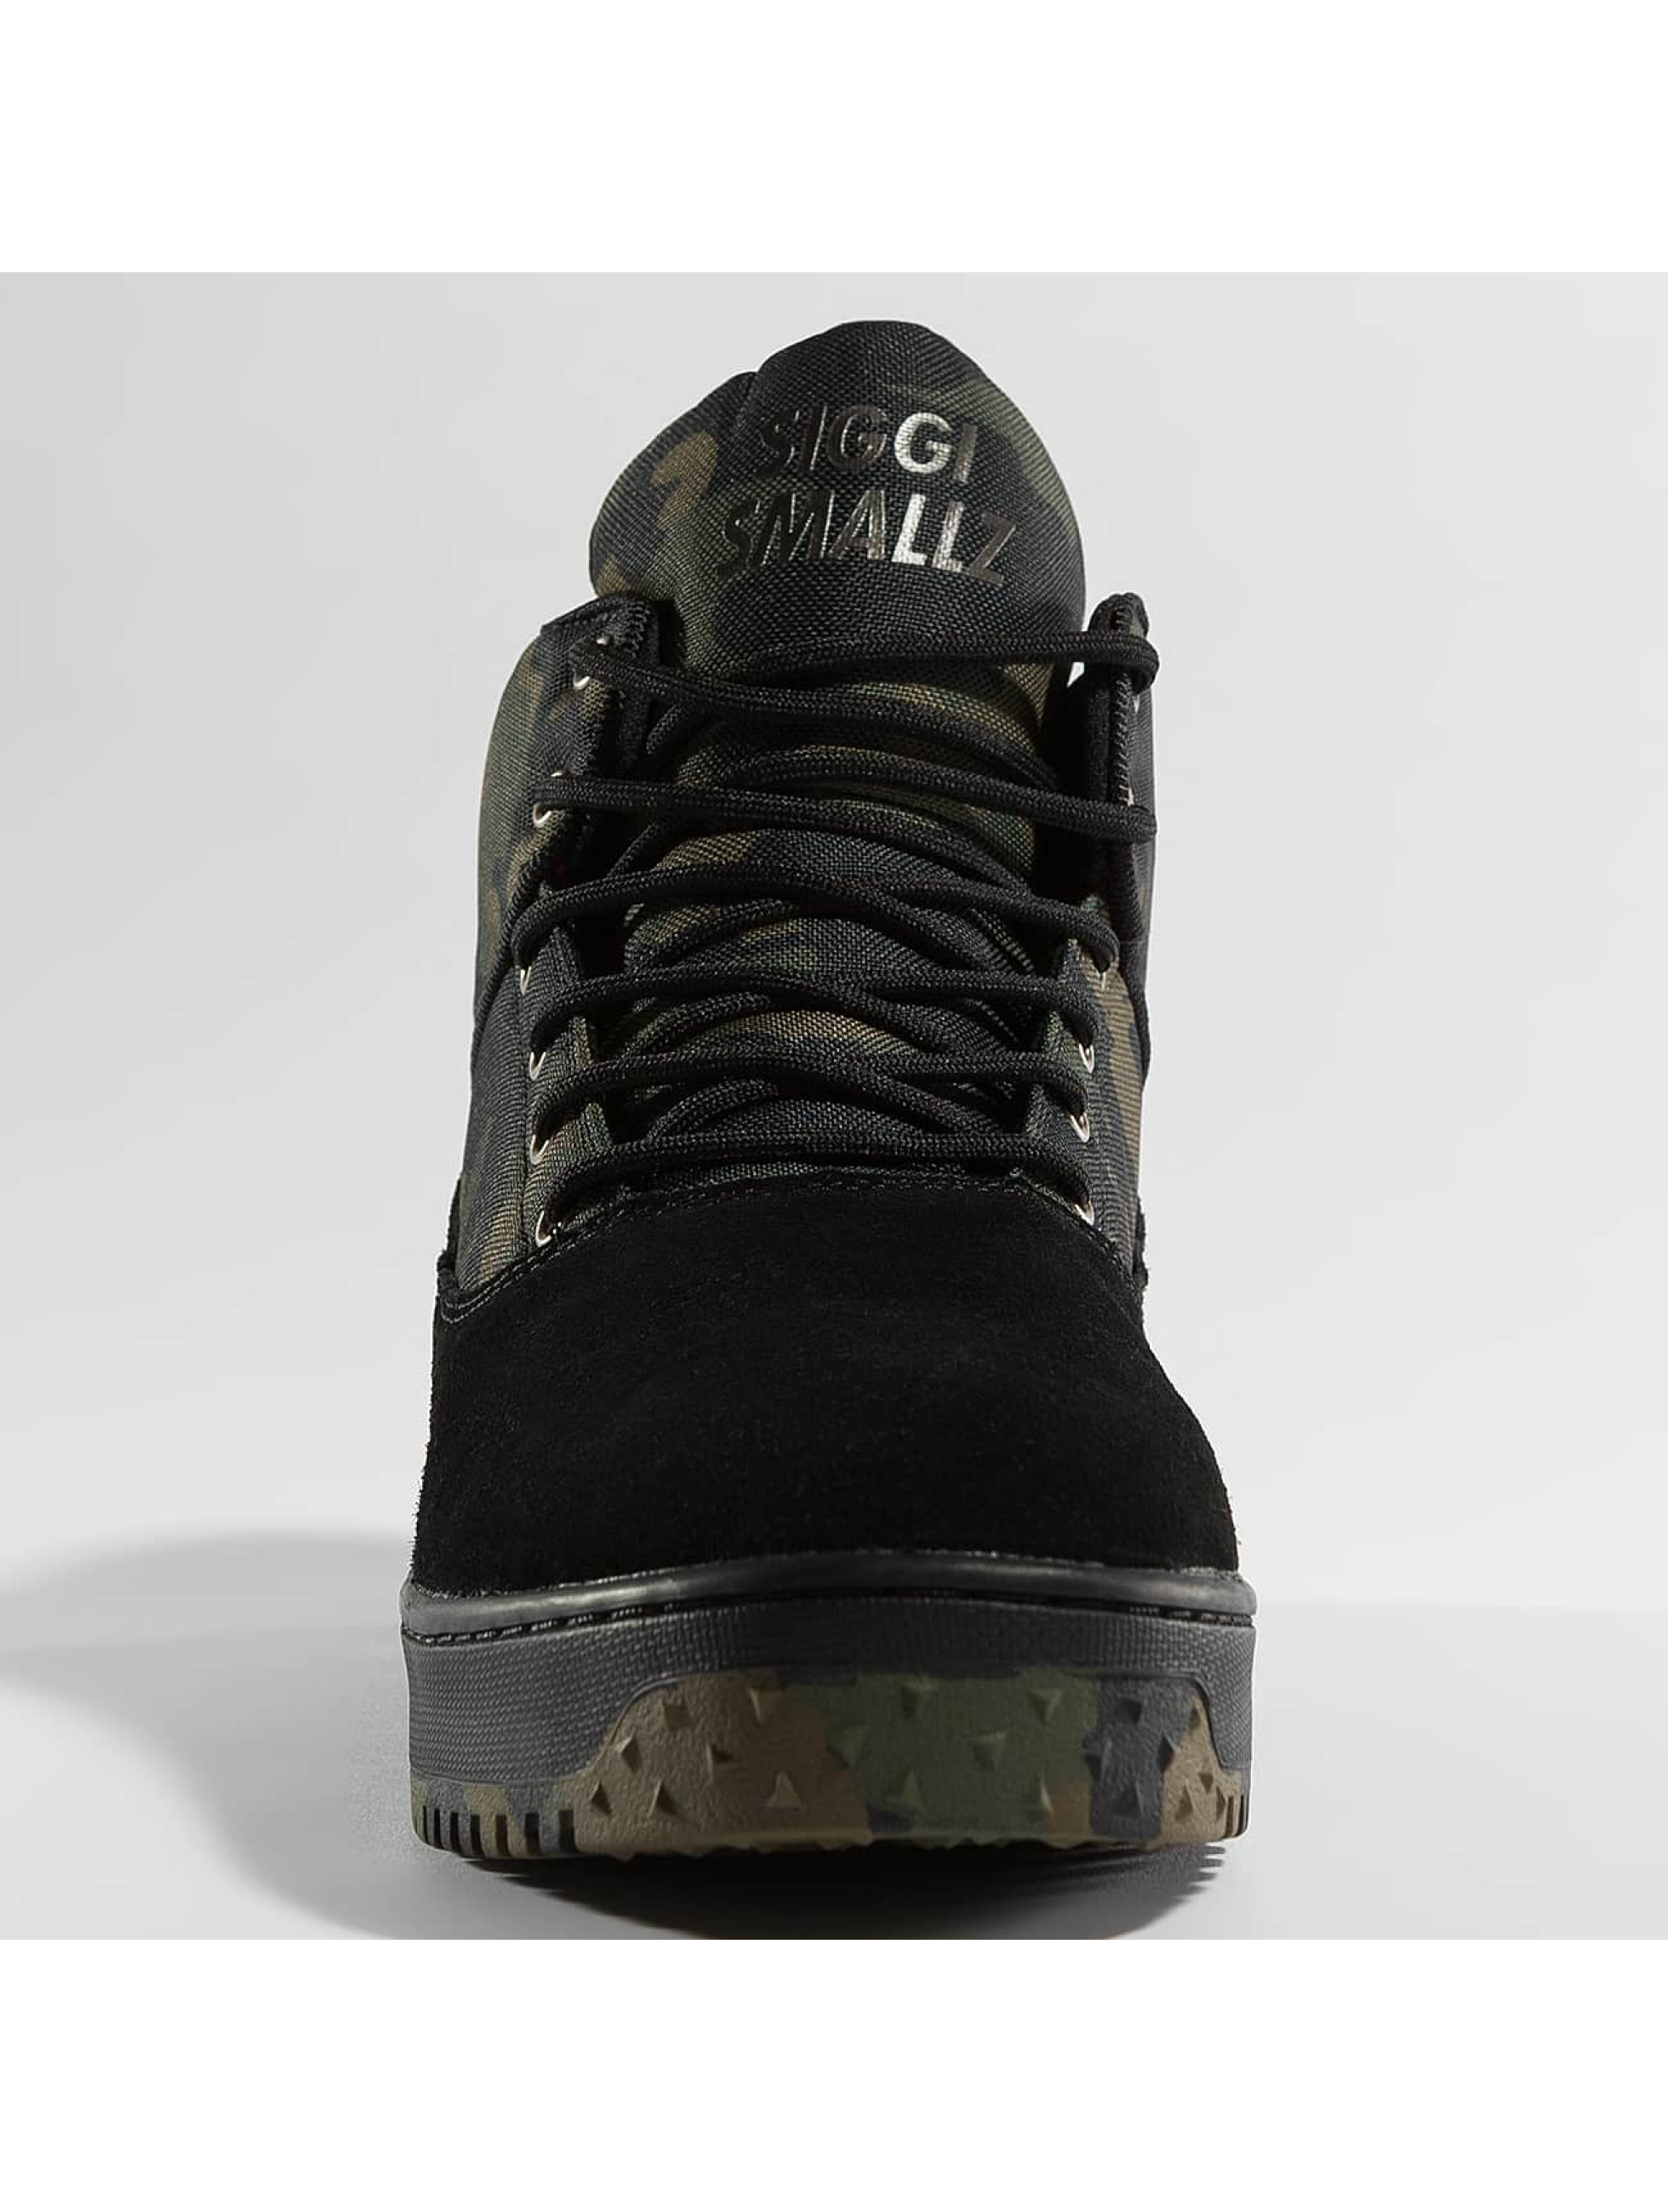 Cayler & Sons Čižmy/Boots Siggi Smallz èierna